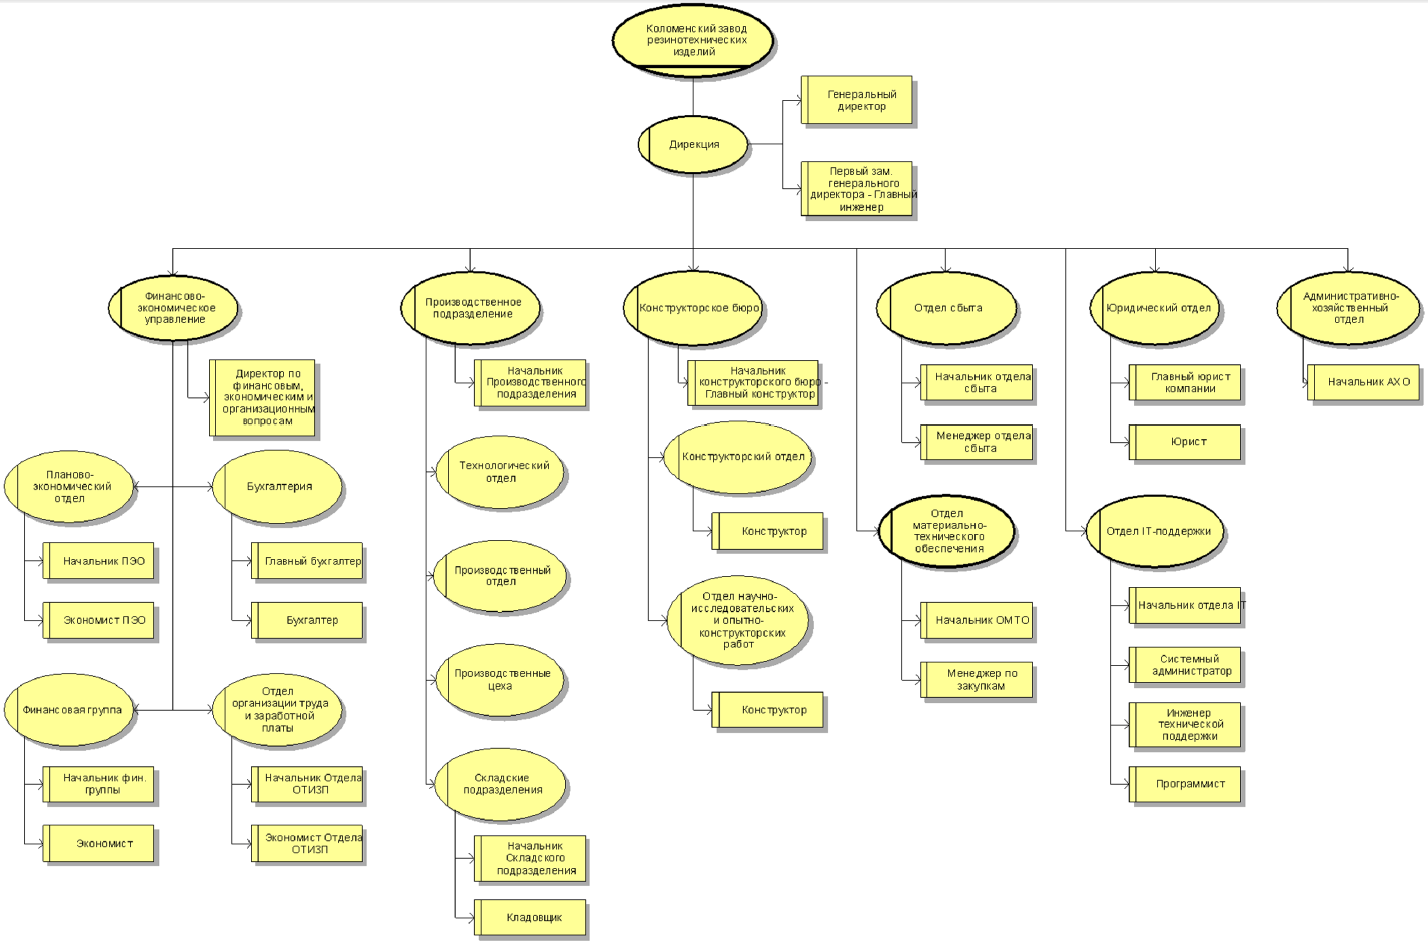 ARIS_organizational_chart